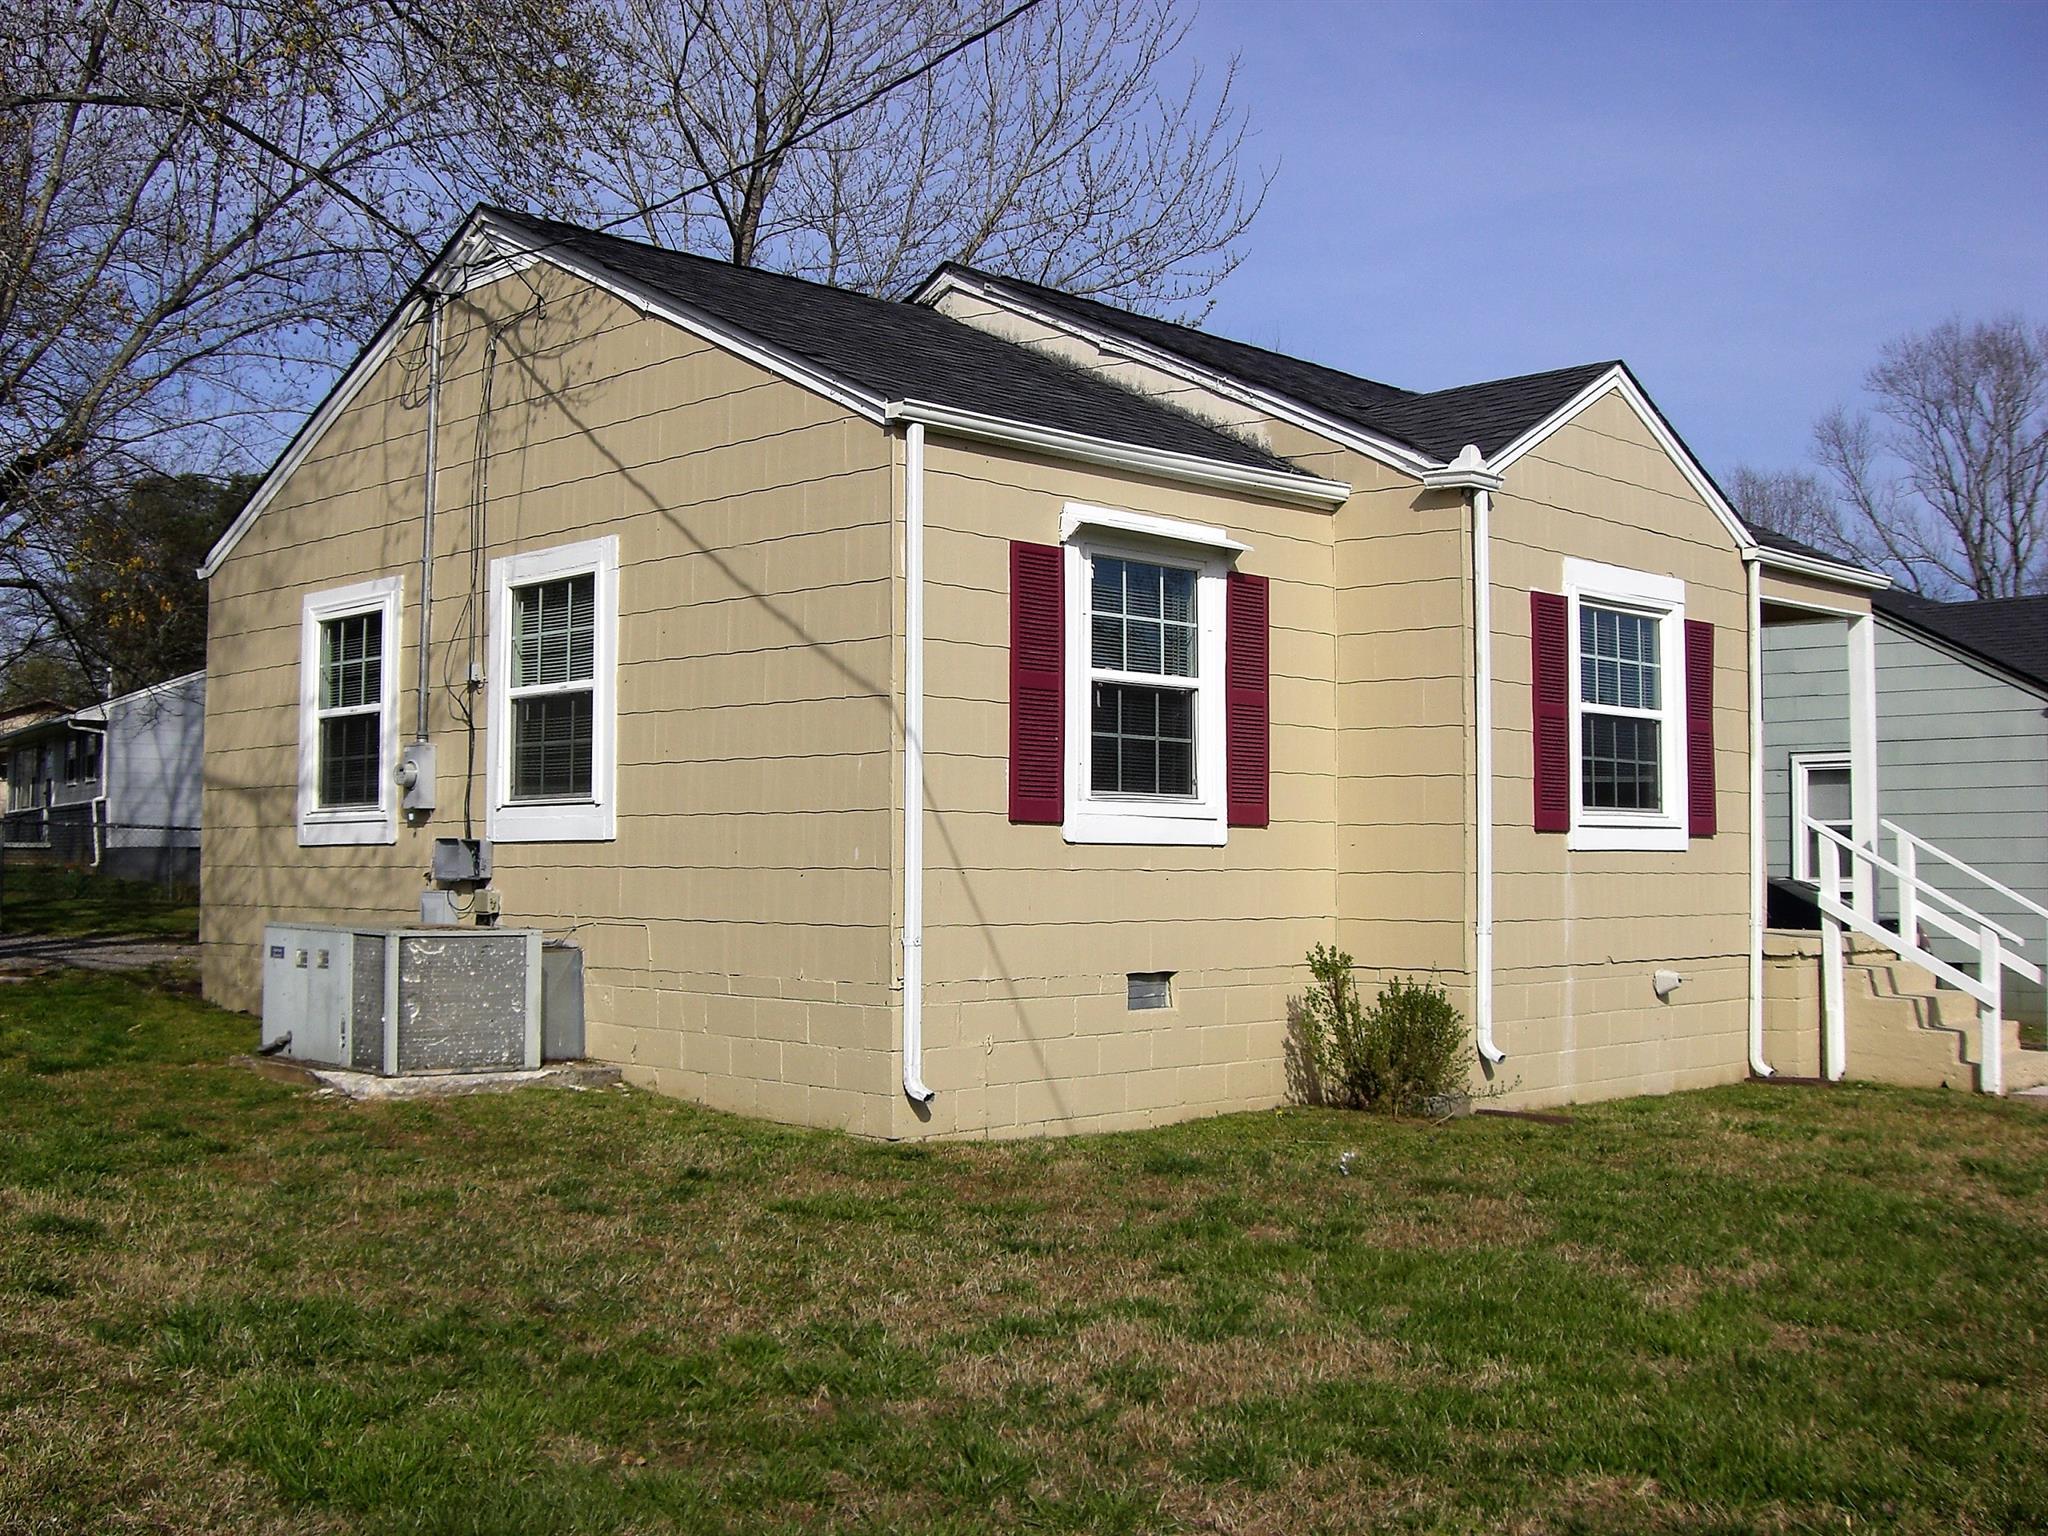 501 Randolph St, Shelbyville, TN 37160 - Shelbyville, TN real estate listing